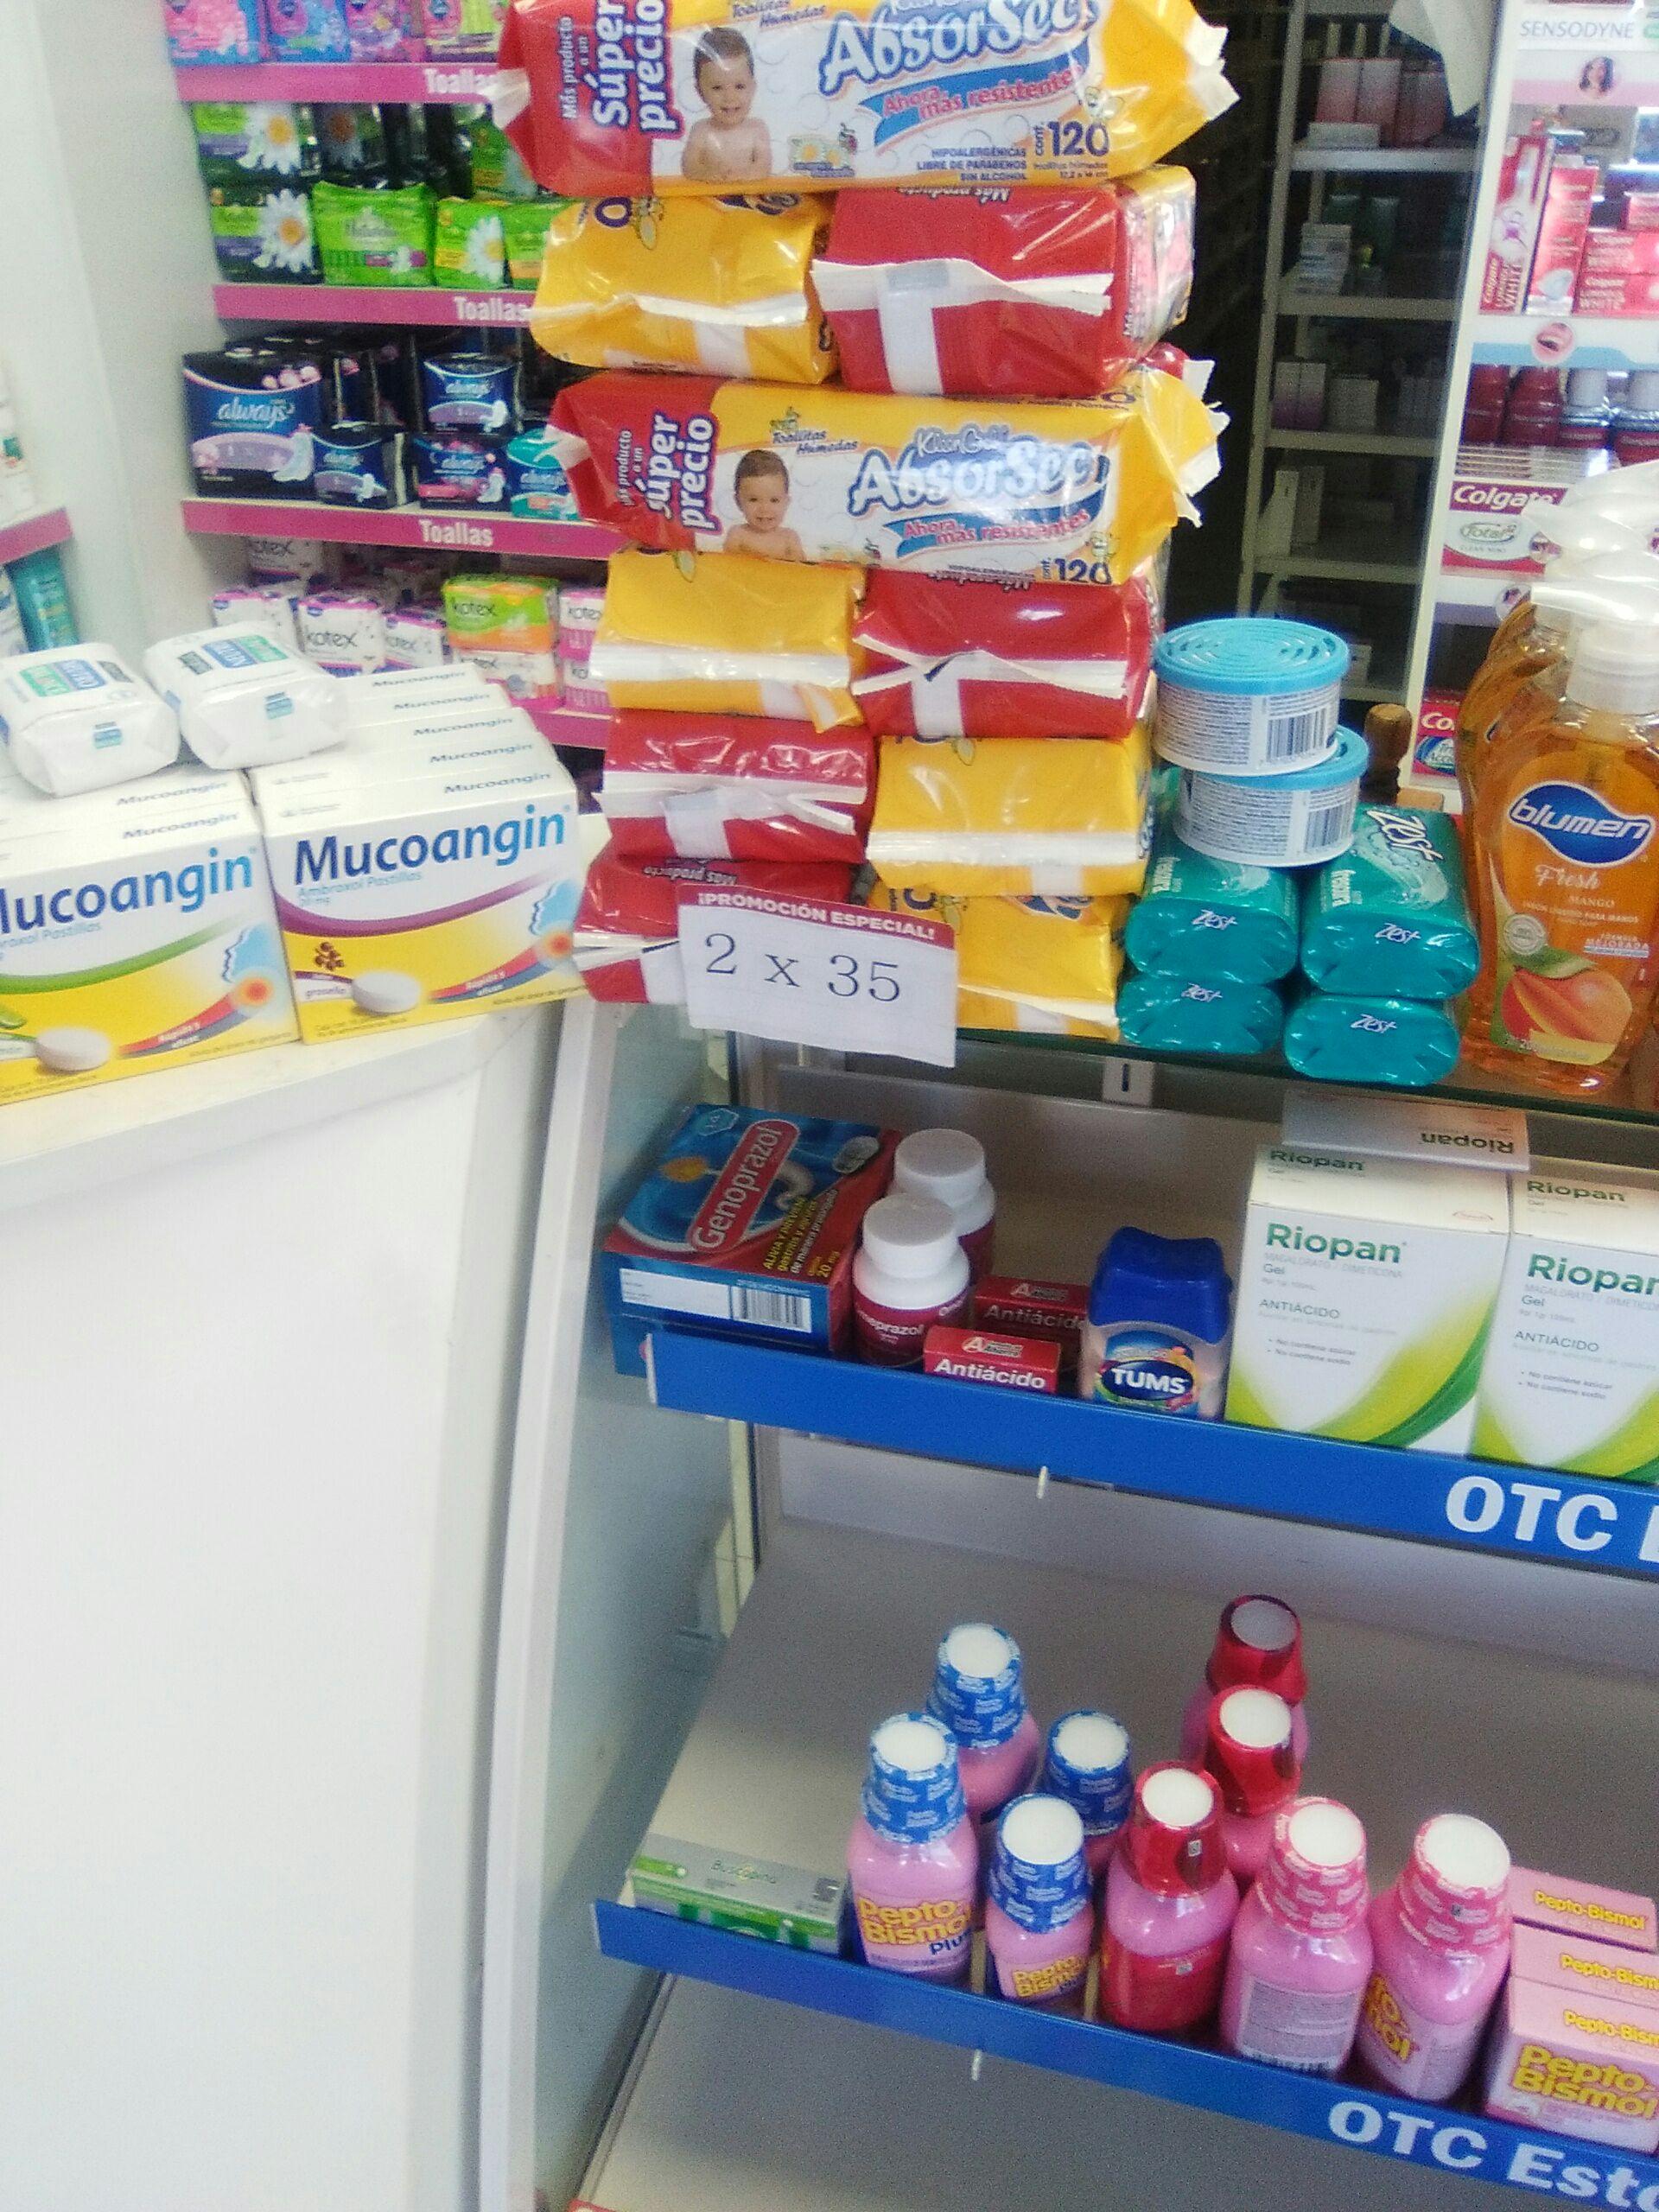 Farmacias del Ahorro: Toallitas húmedas Absorsec